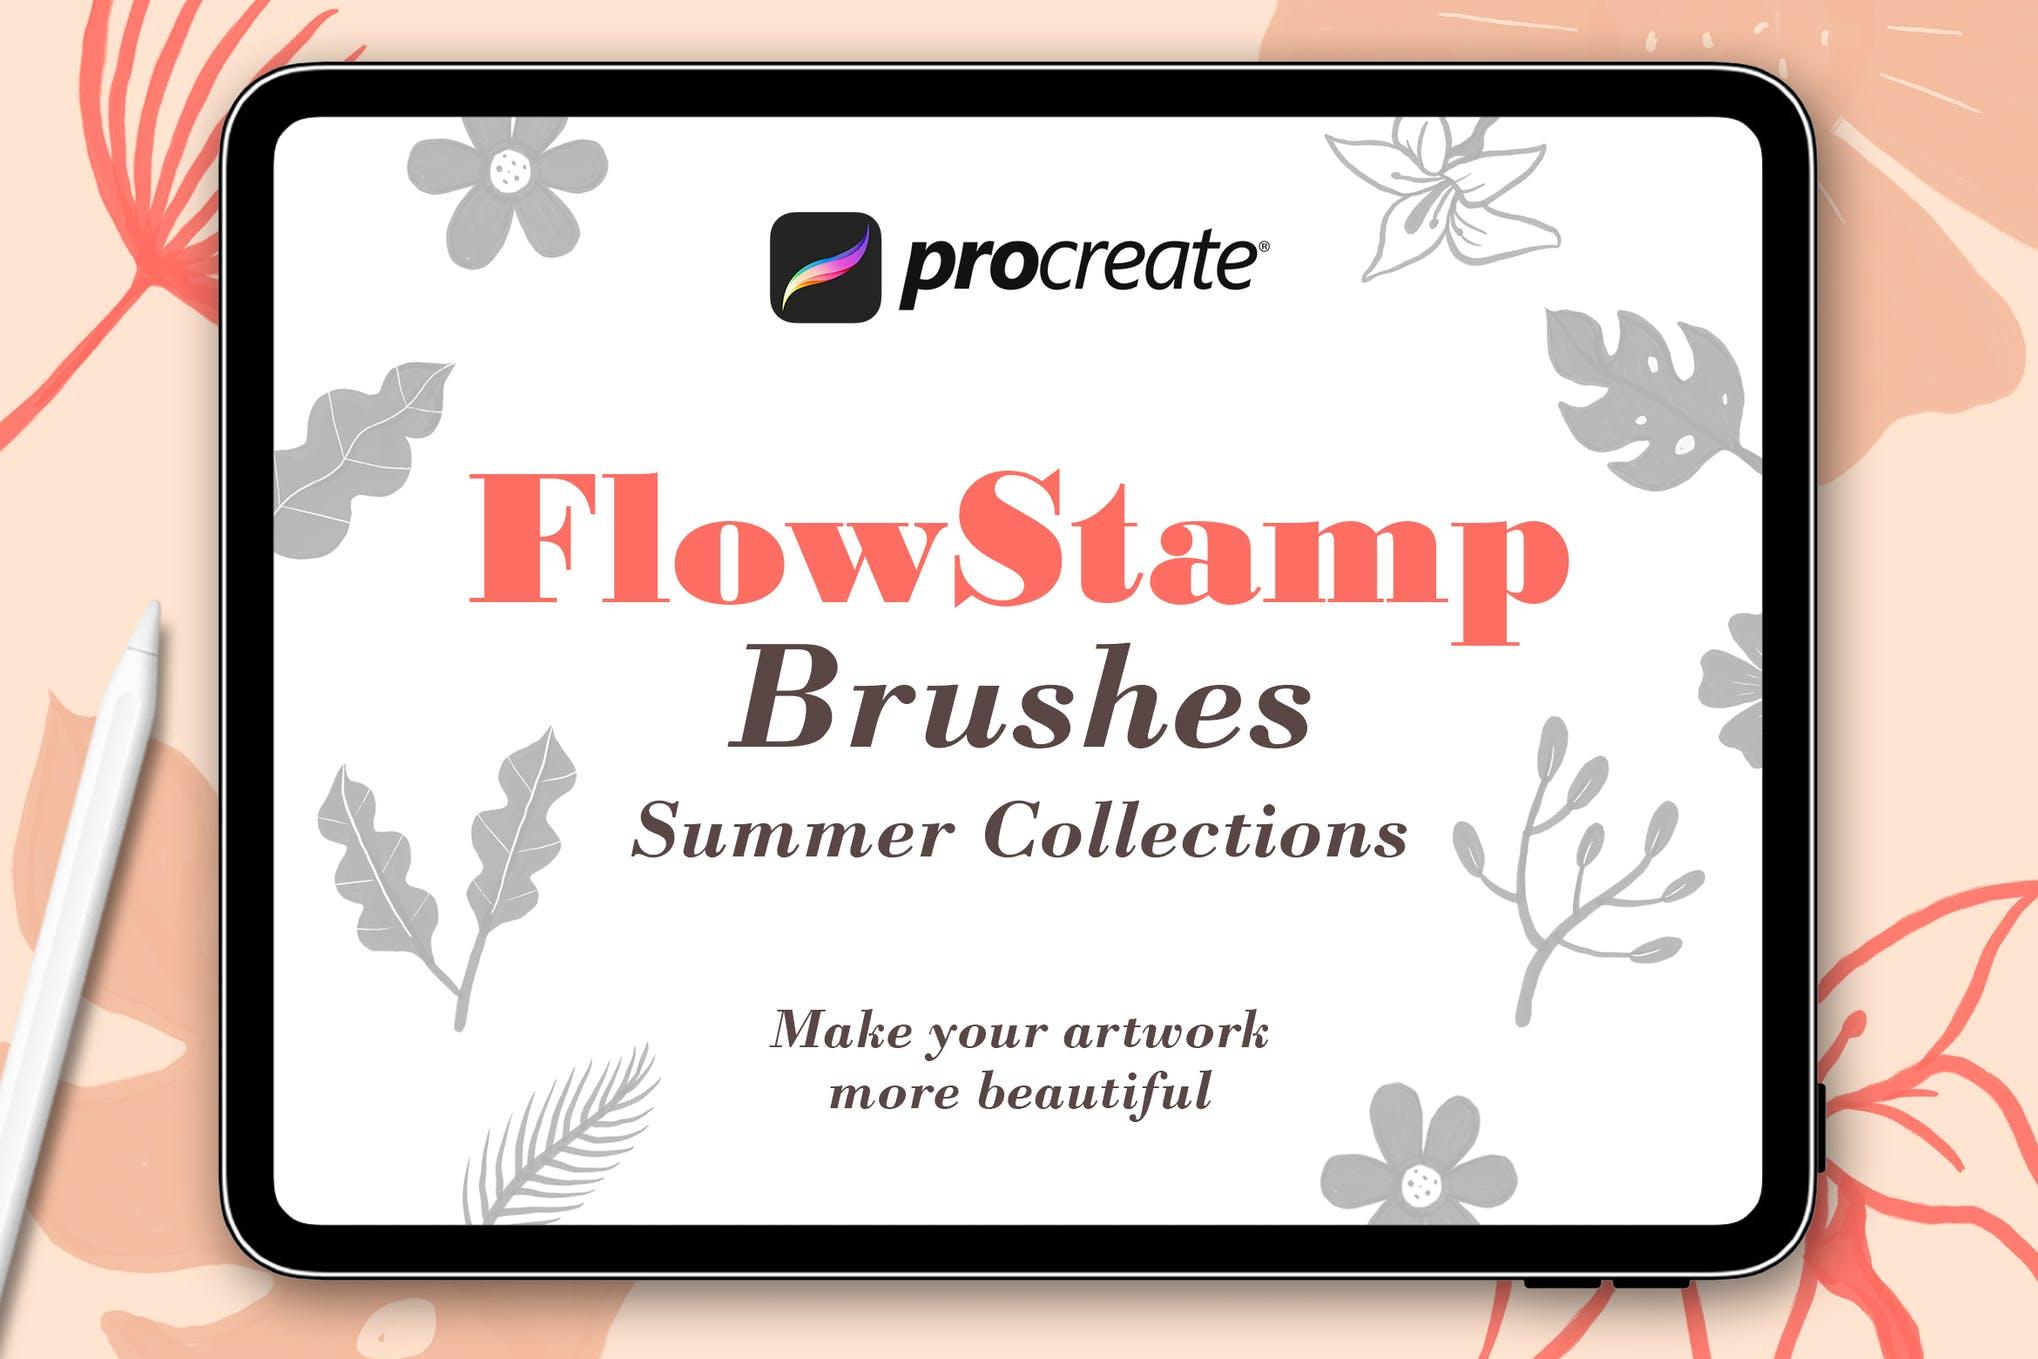 FlowStamp - Procreate Brush